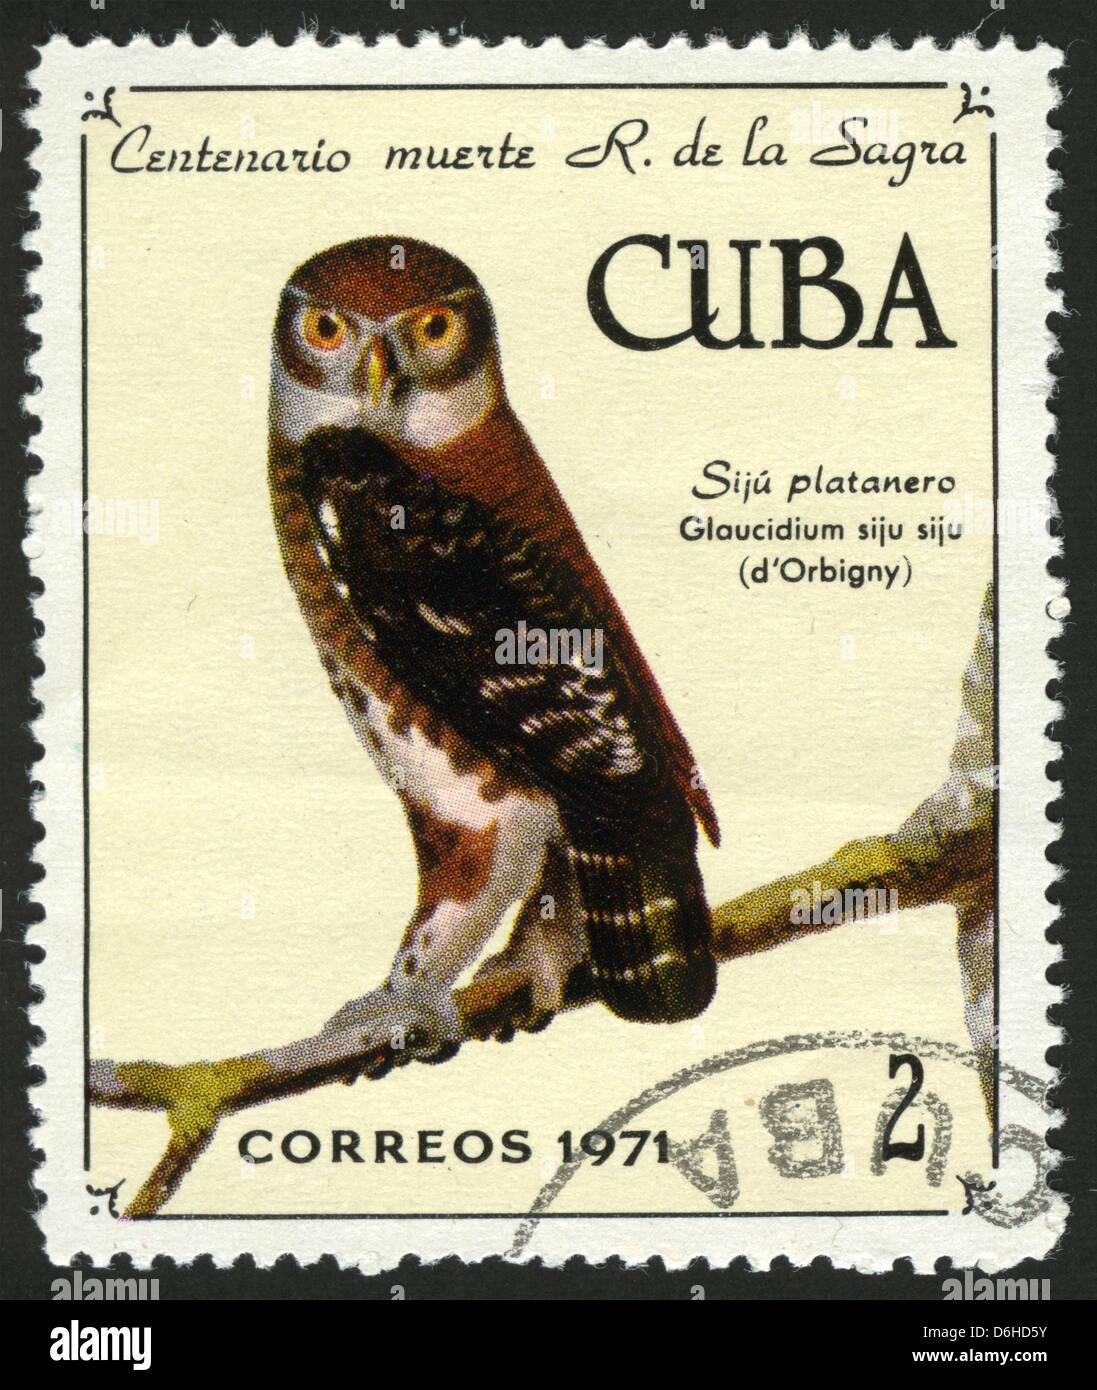 Cubapost Markstampbirds Bird Animalsanimals Illustrations